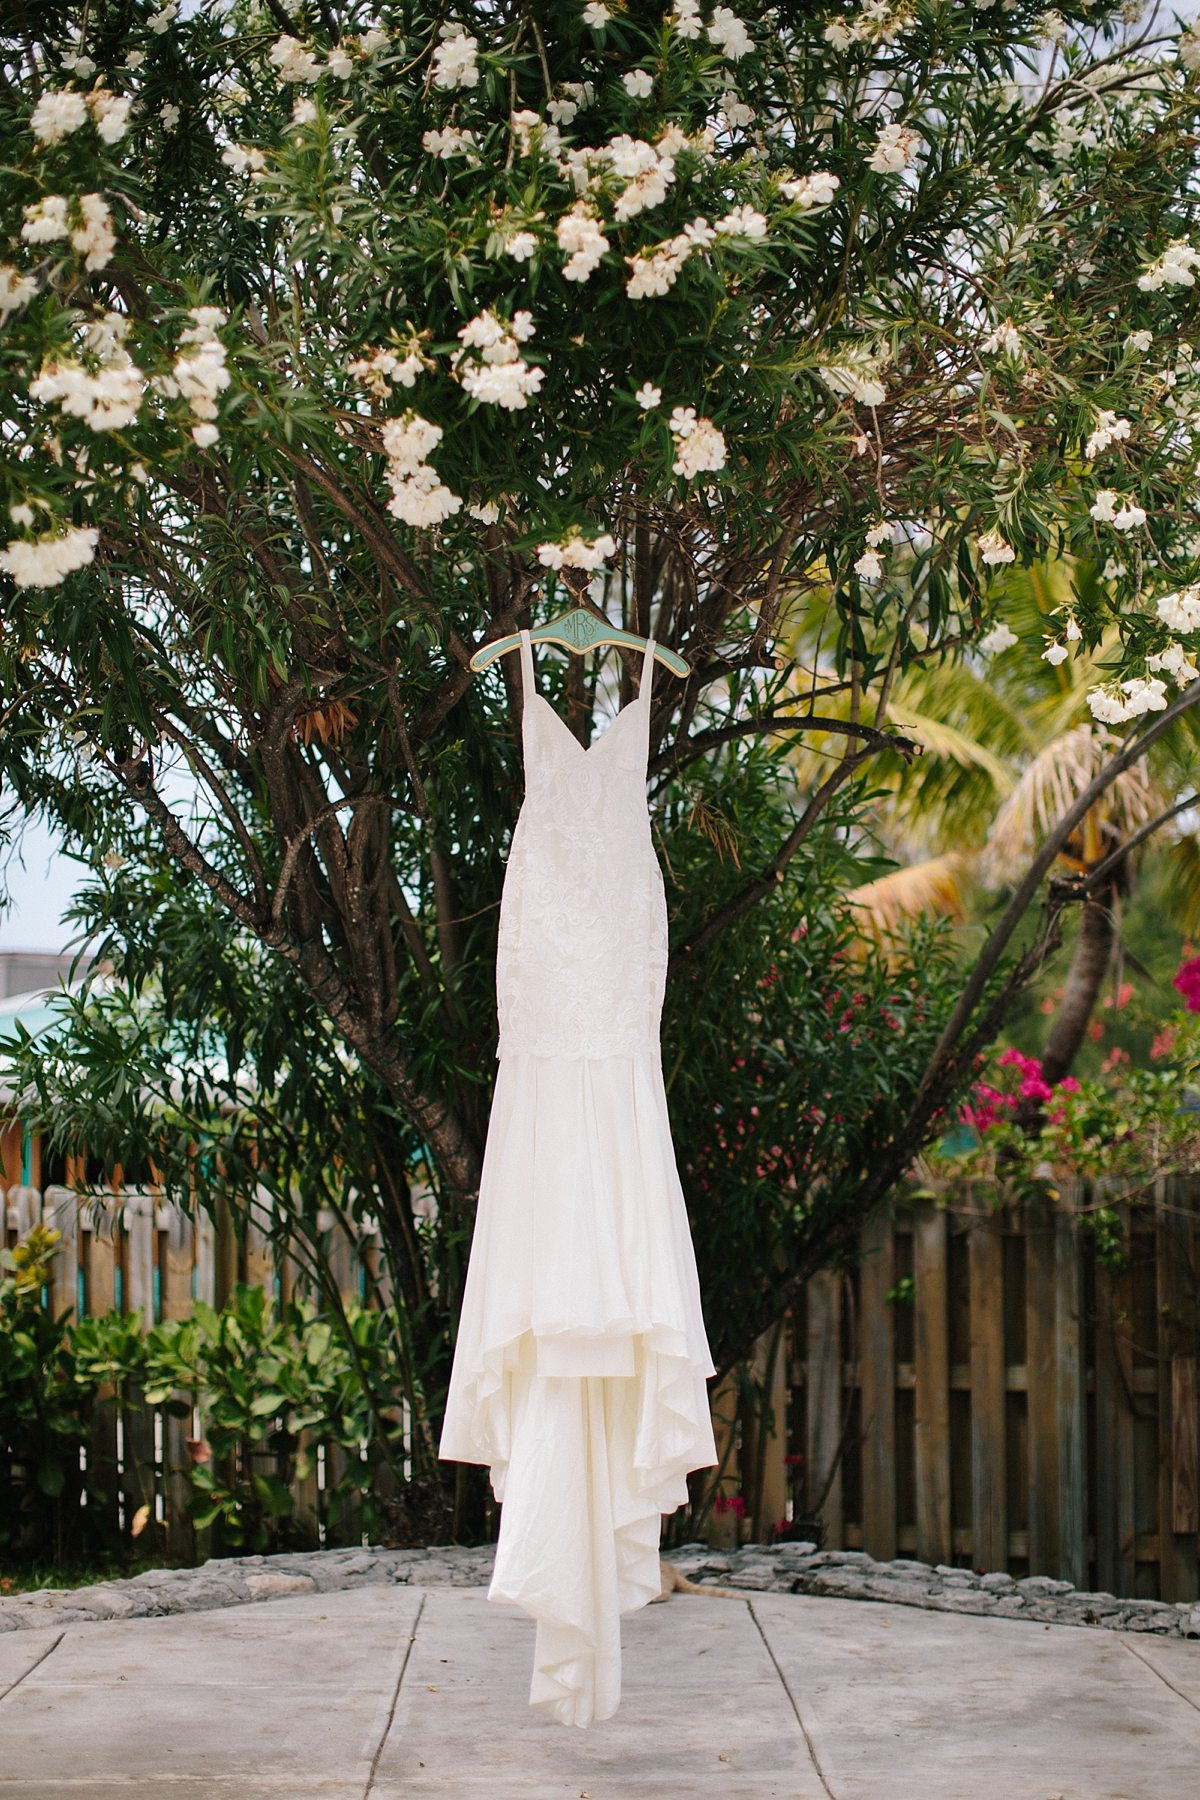 bahamas-destination-wedding-photographer-island-private-ceremony-staniel-cay_0012.jpg